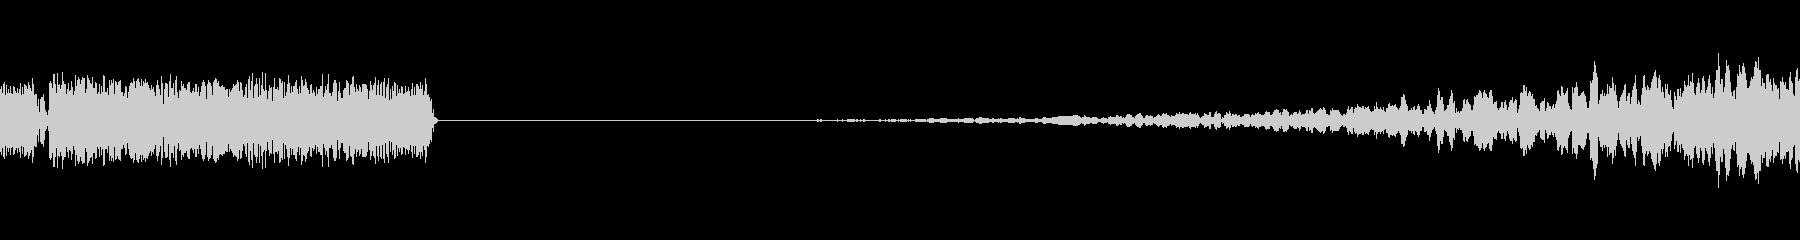 SciFi EC01_90_2の未再生の波形